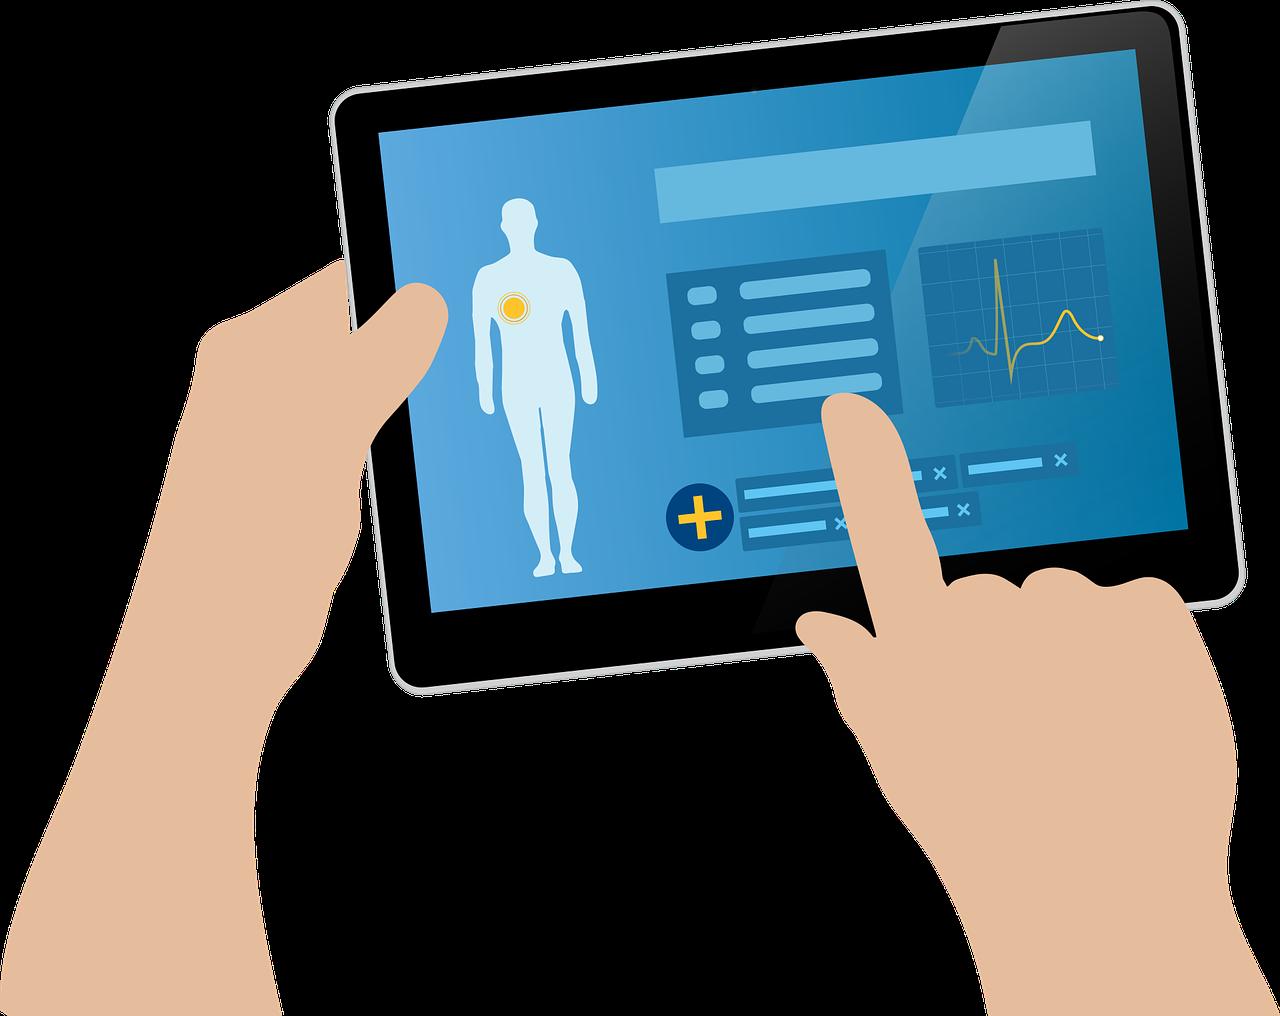 John Hancock tech partner to enable real-time health record sharing